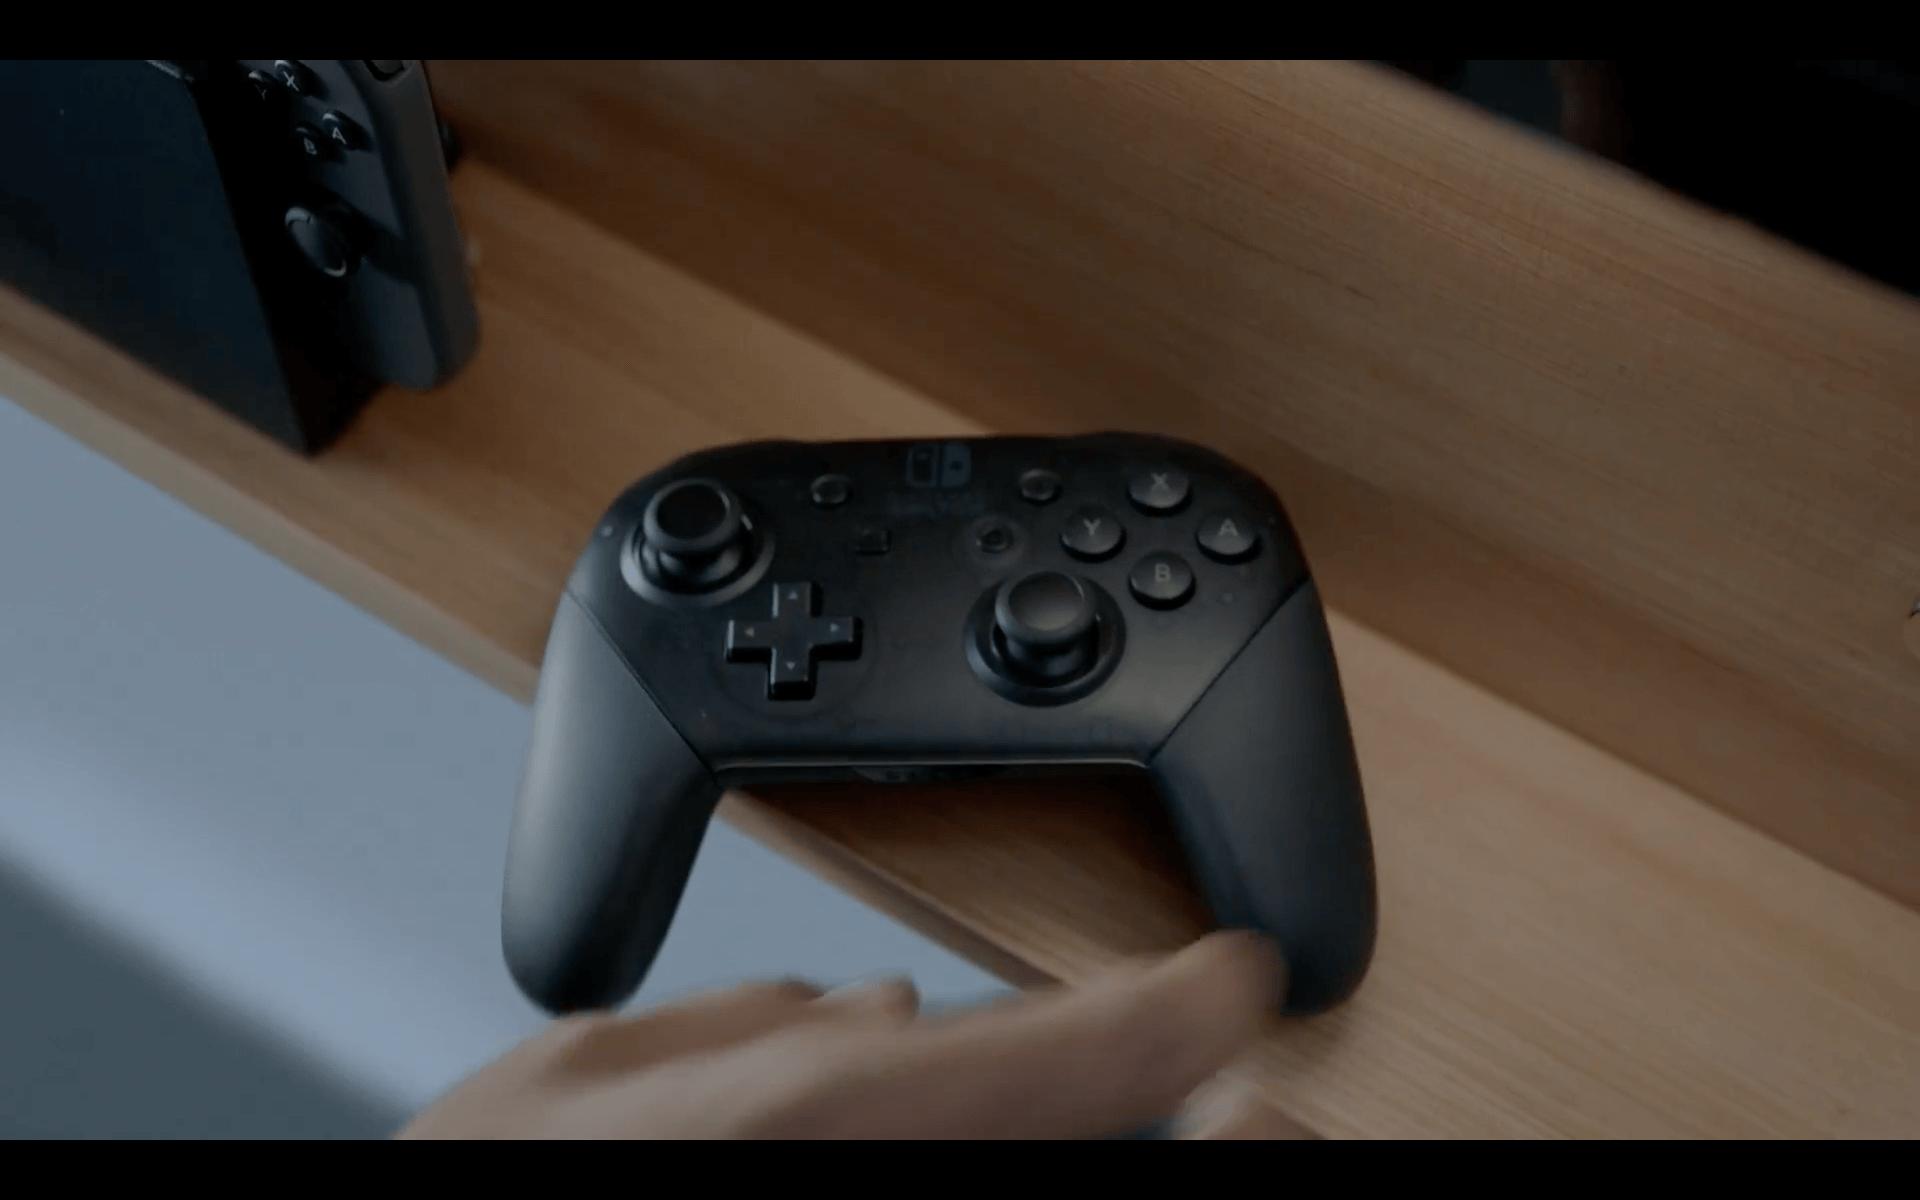 Nintendo switch la console de salon portable nx enfin officialis e frandroid - Console de salon android ...